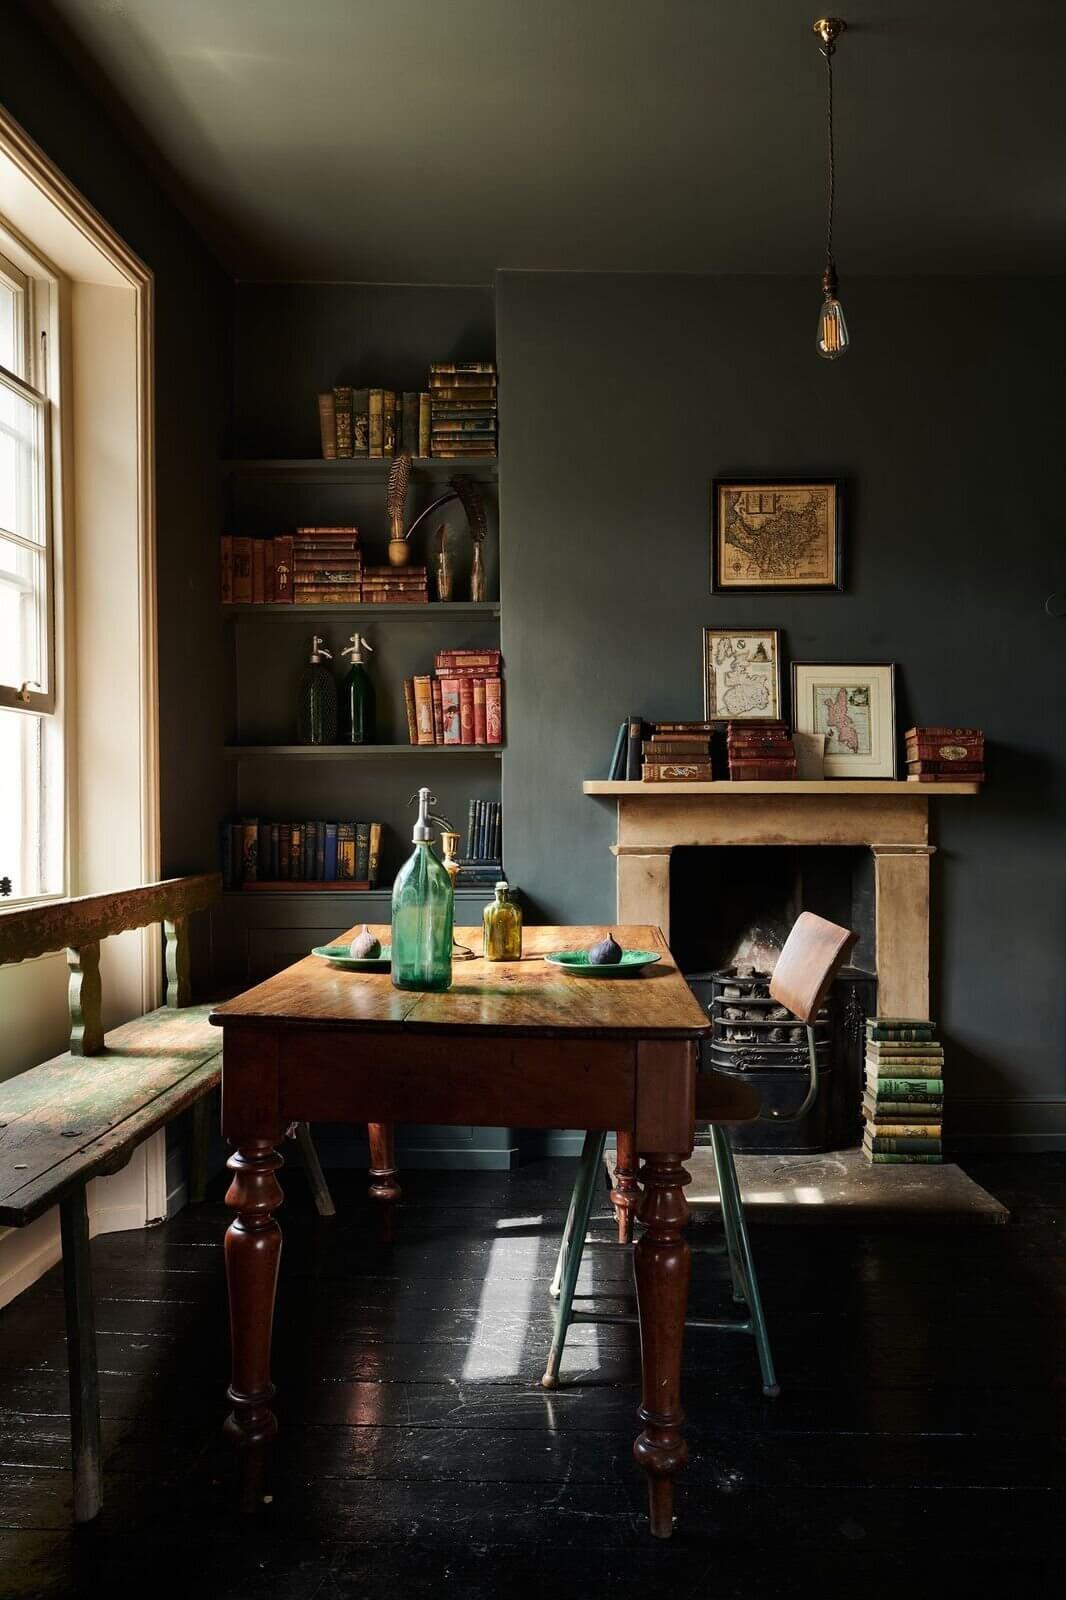 A Moody Haberdasher's Kitchen by deVOL